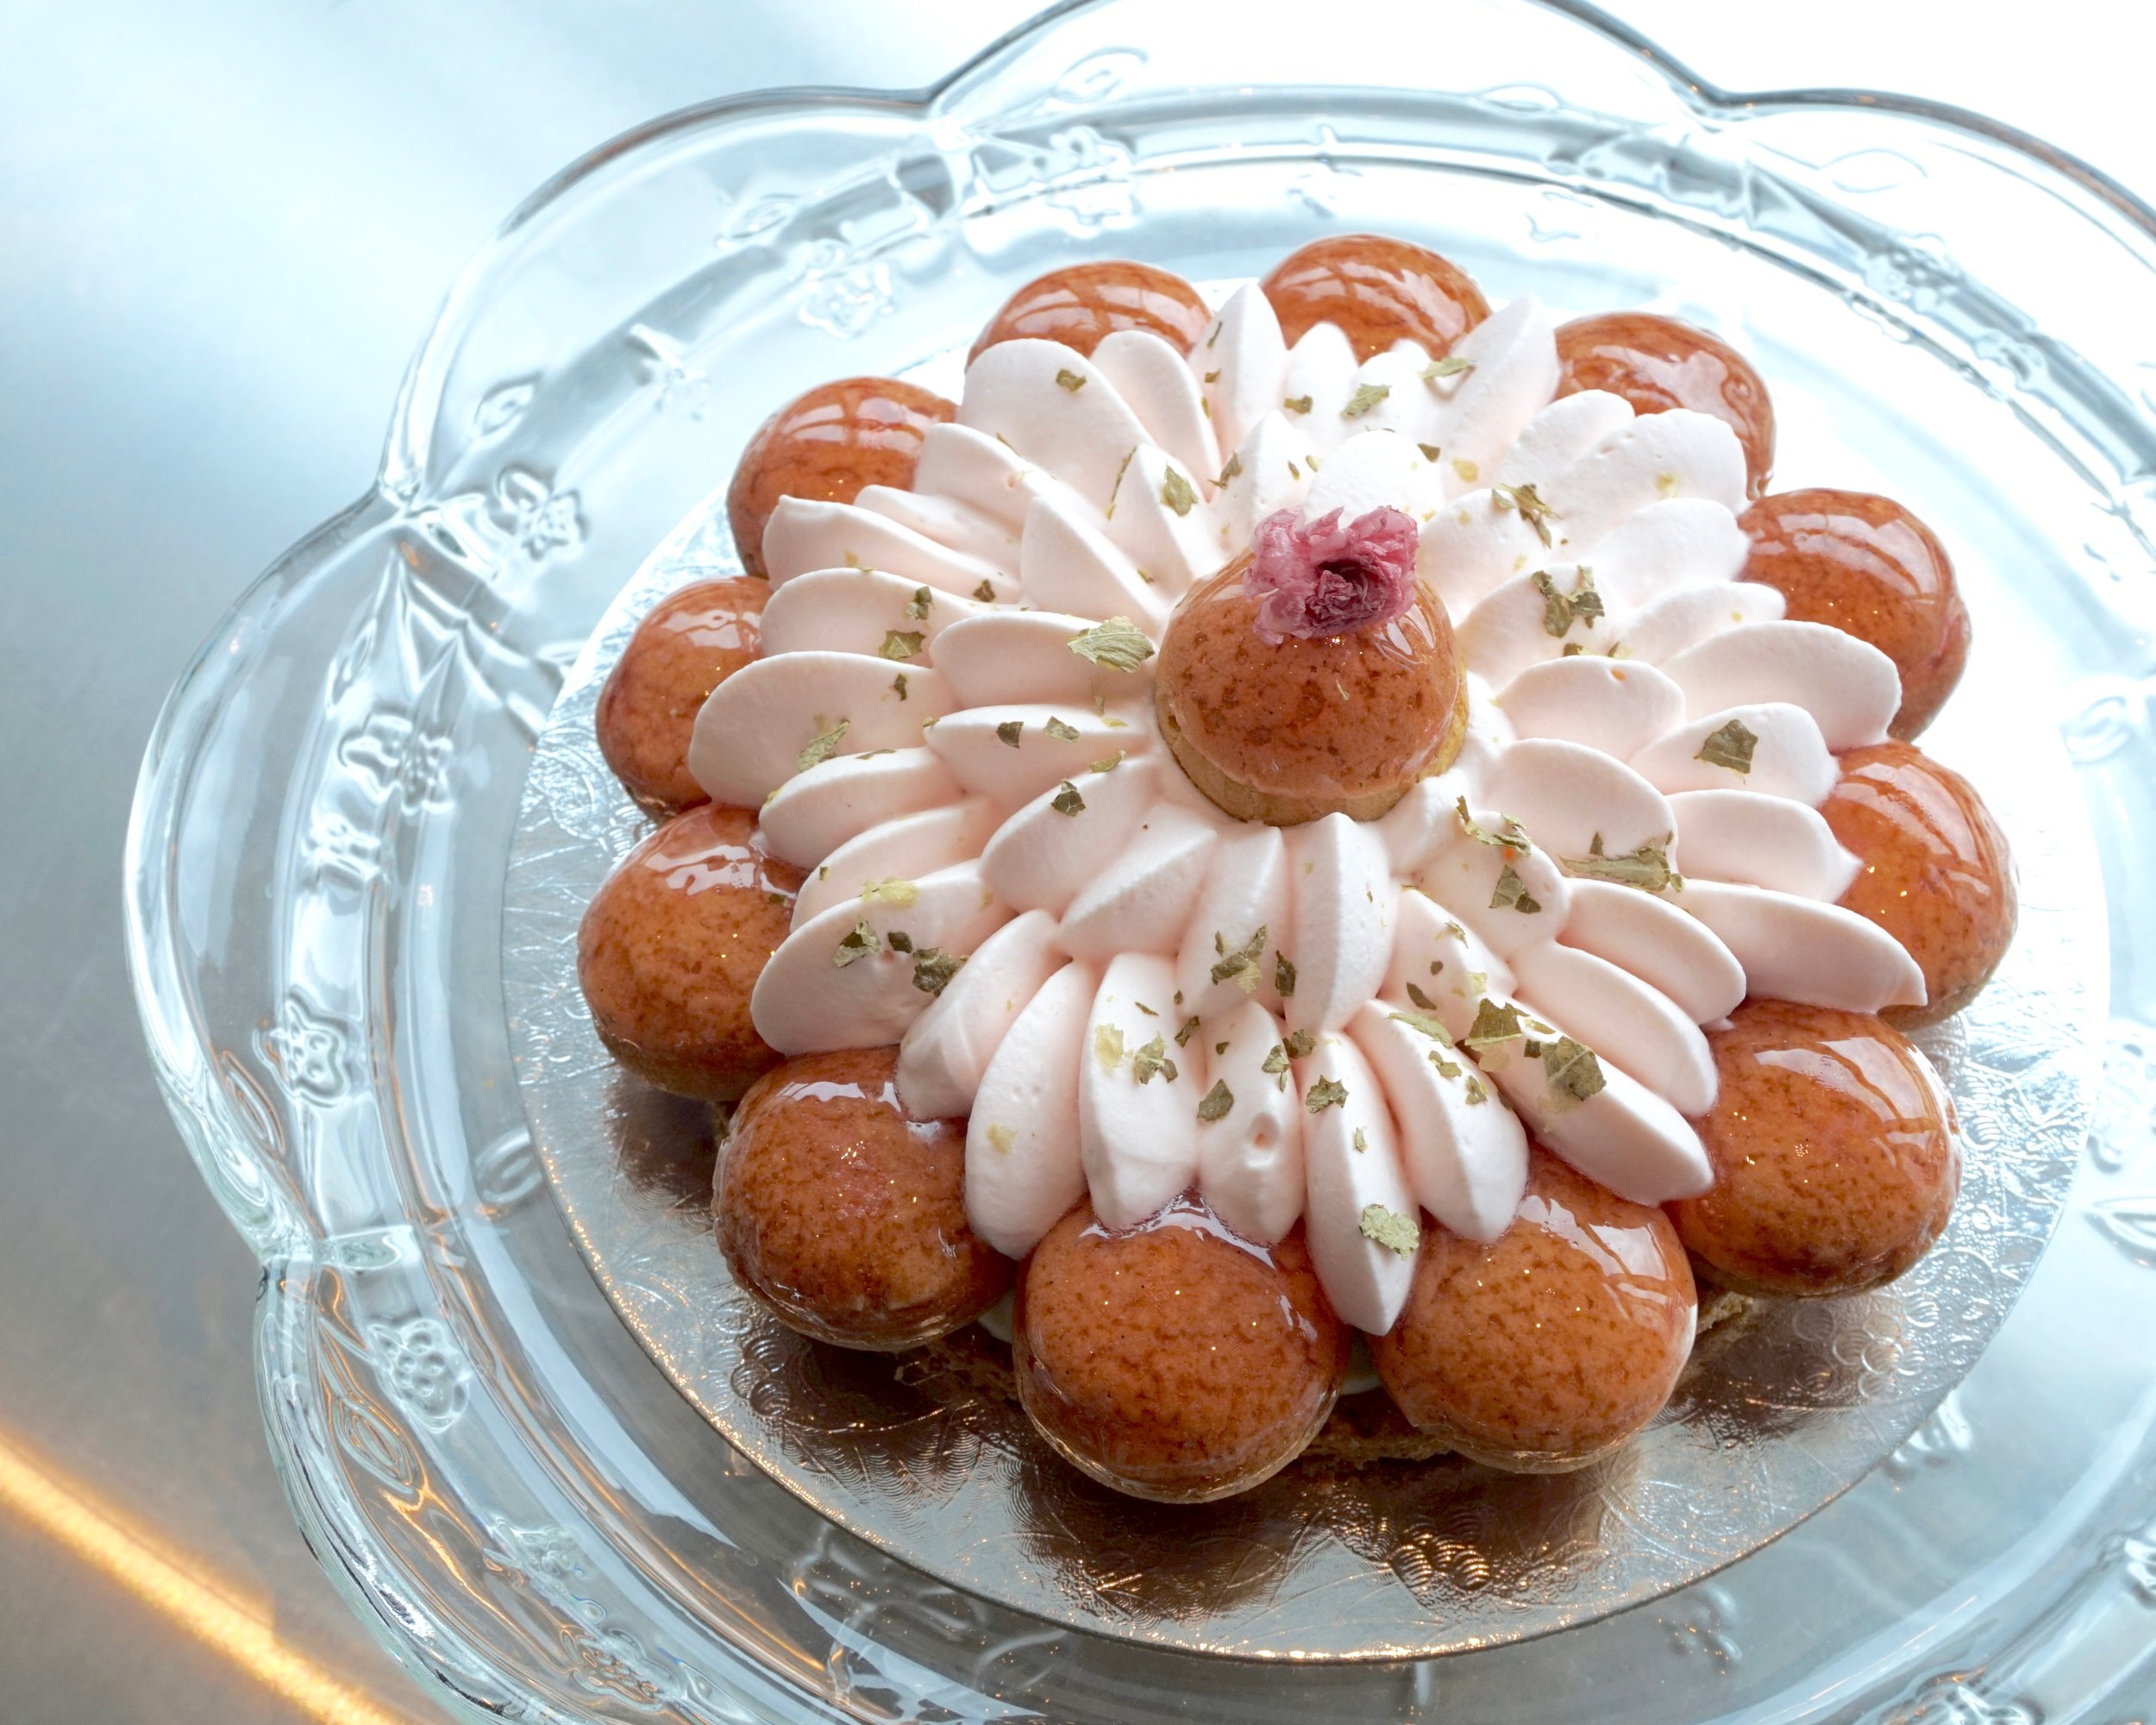 Sakura saint honore cake made by Gusta Cooking Studio